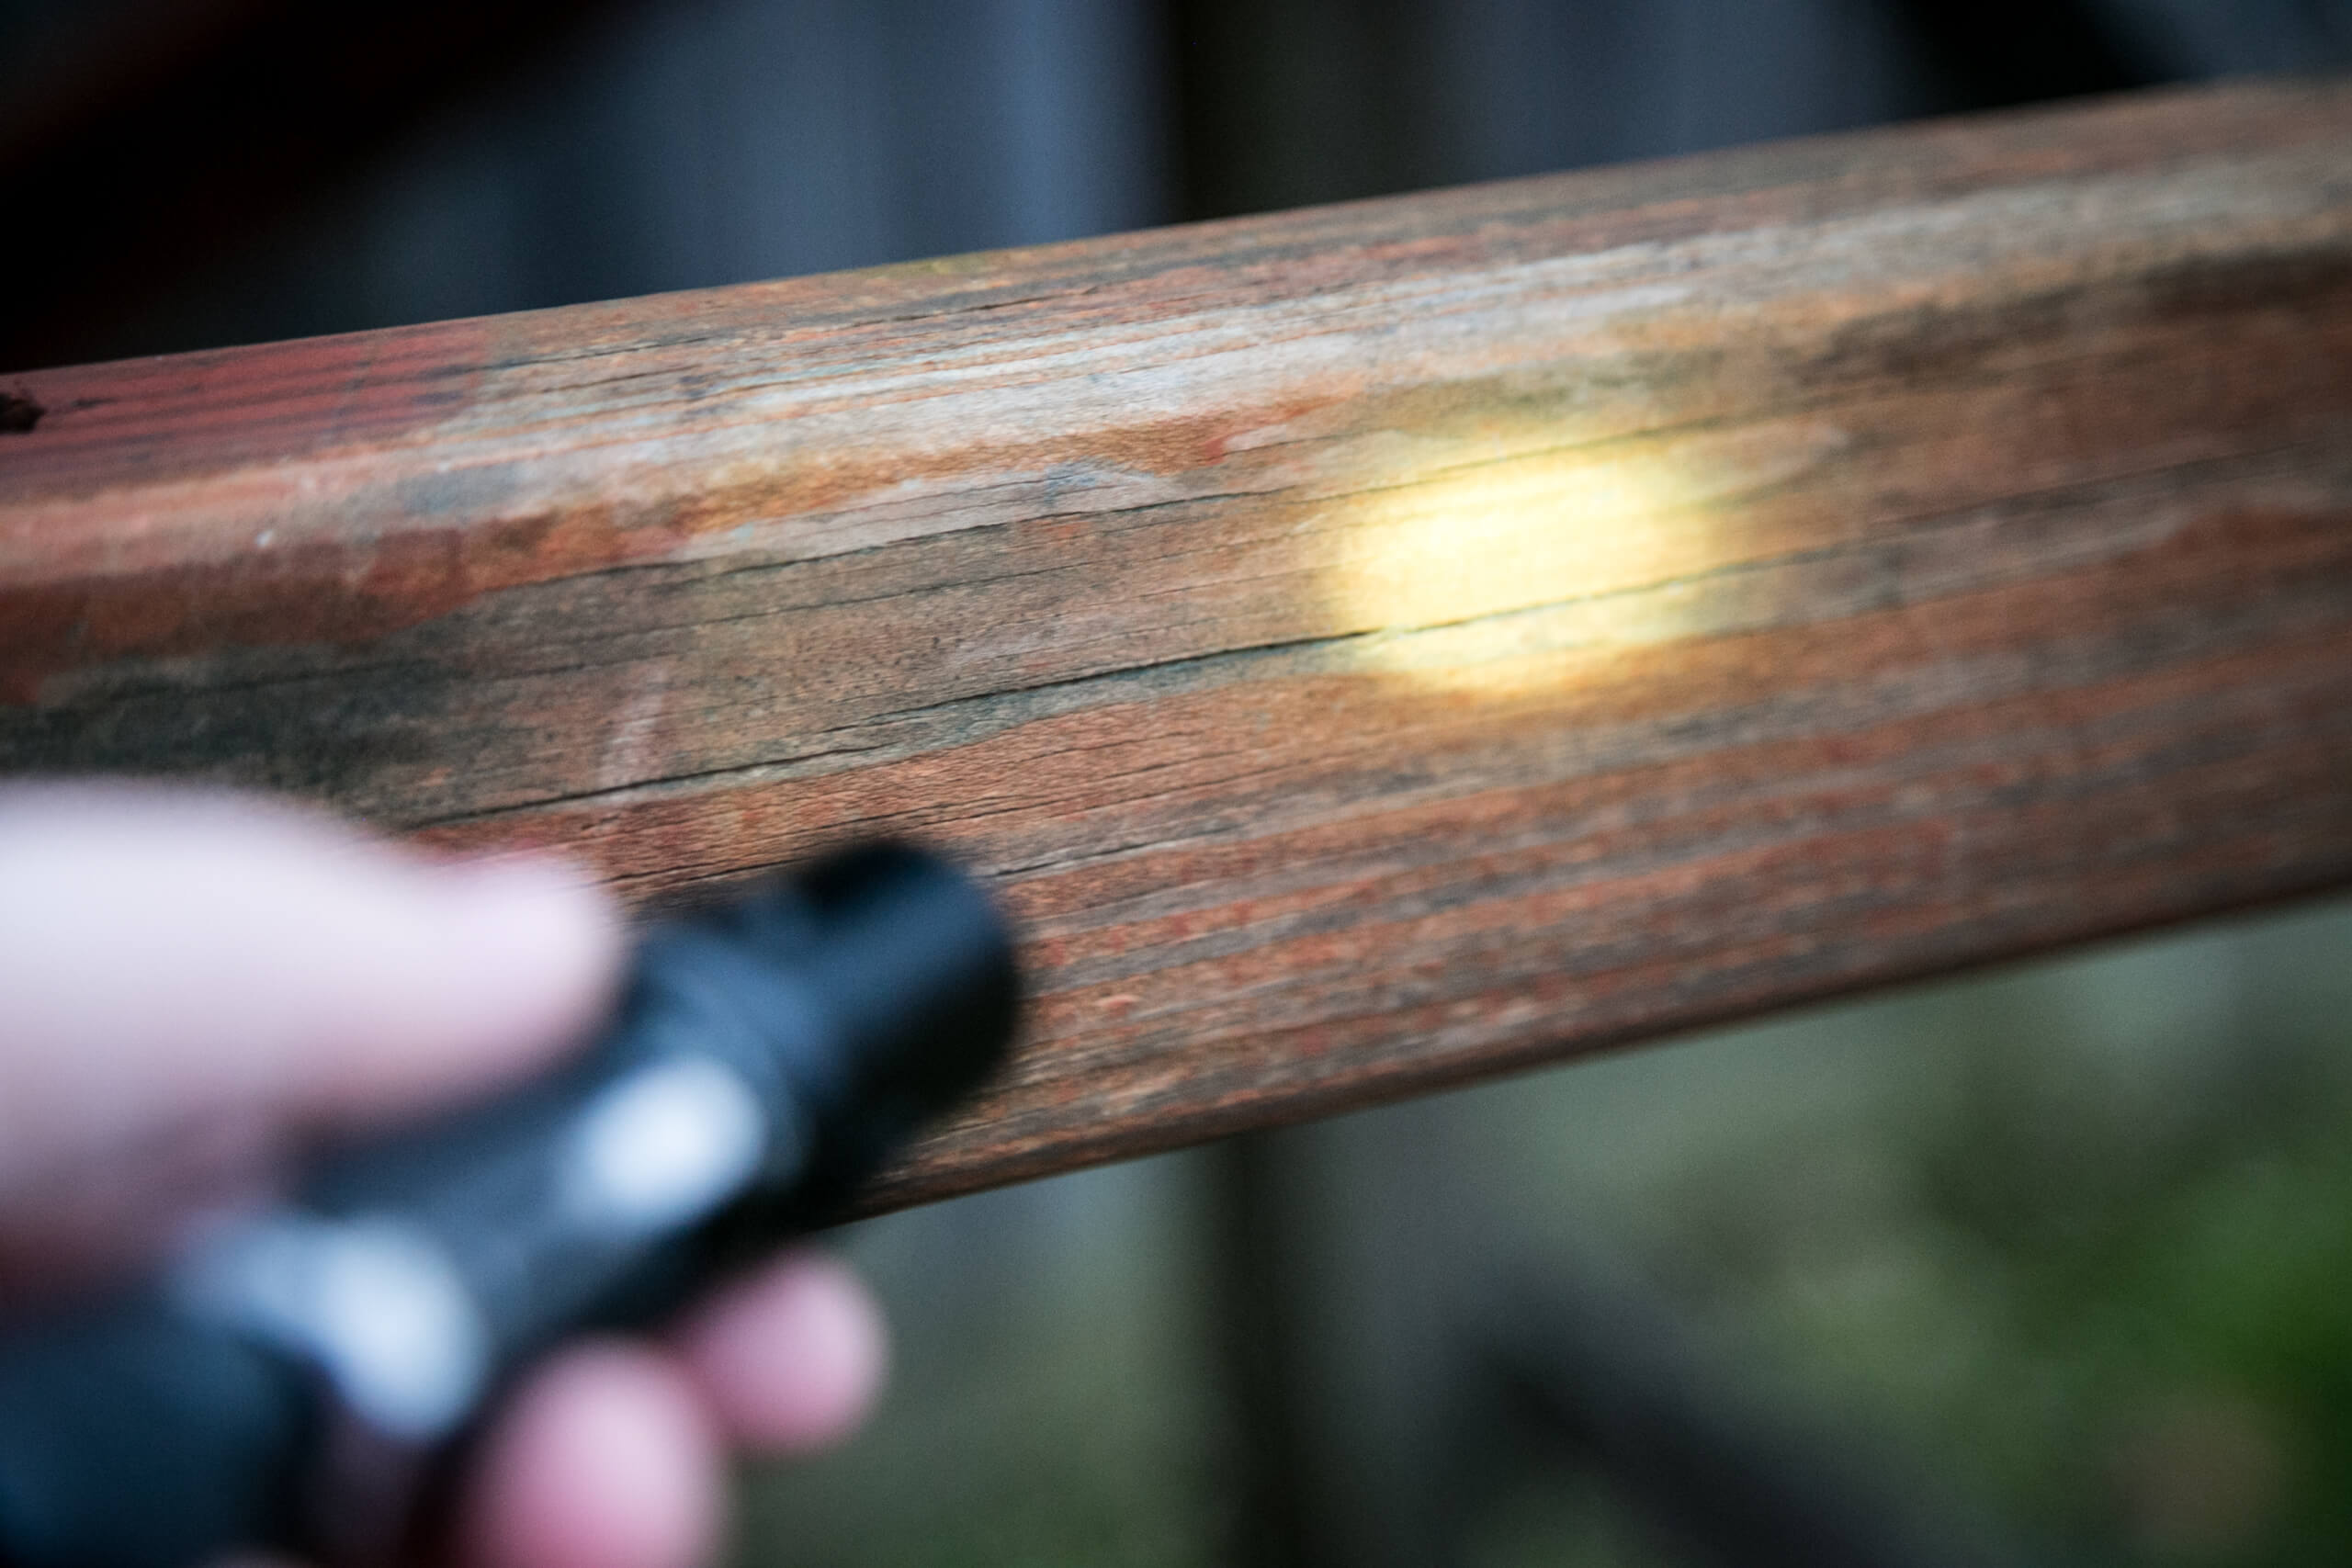 sofirn sp31uv ultraviolet 18650 flashlight beamshot